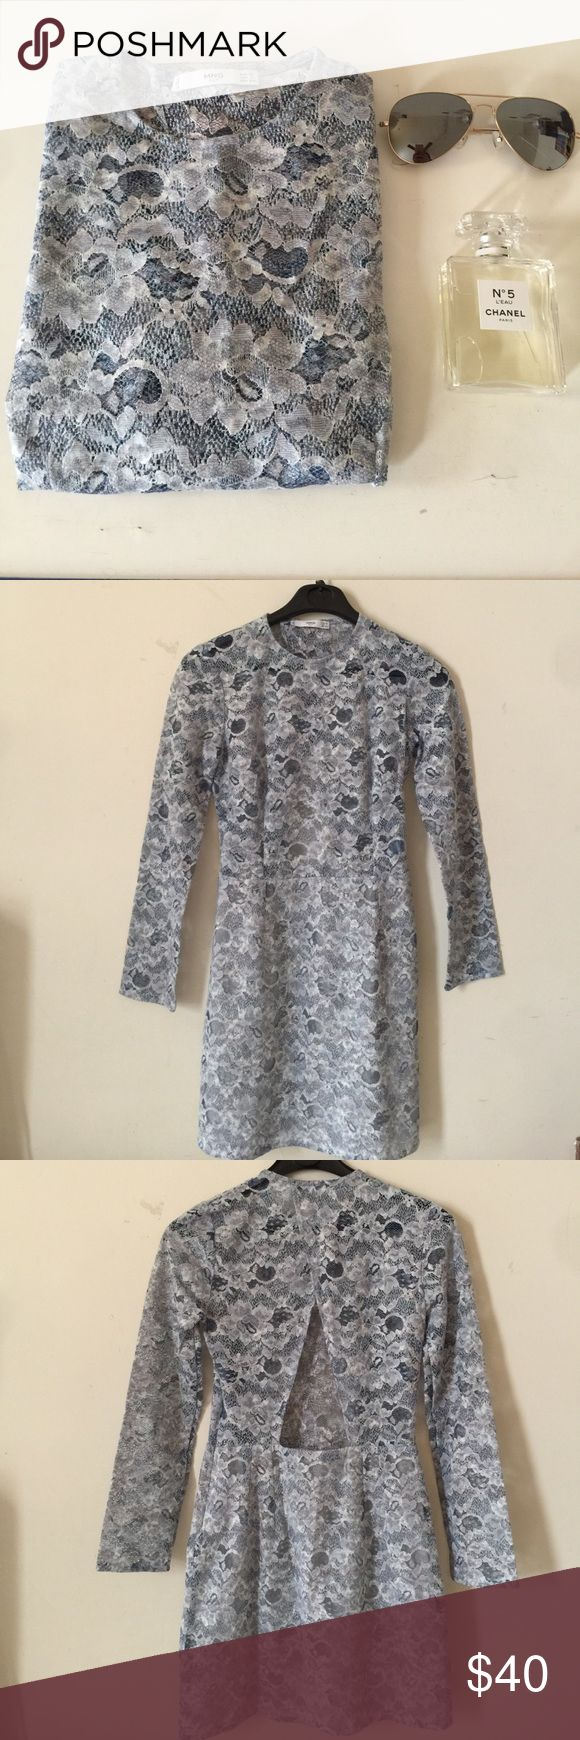 Mango outlet dress size 2 Brand new dress ,fit size like 0,never worn light blue mango Dresses Mini